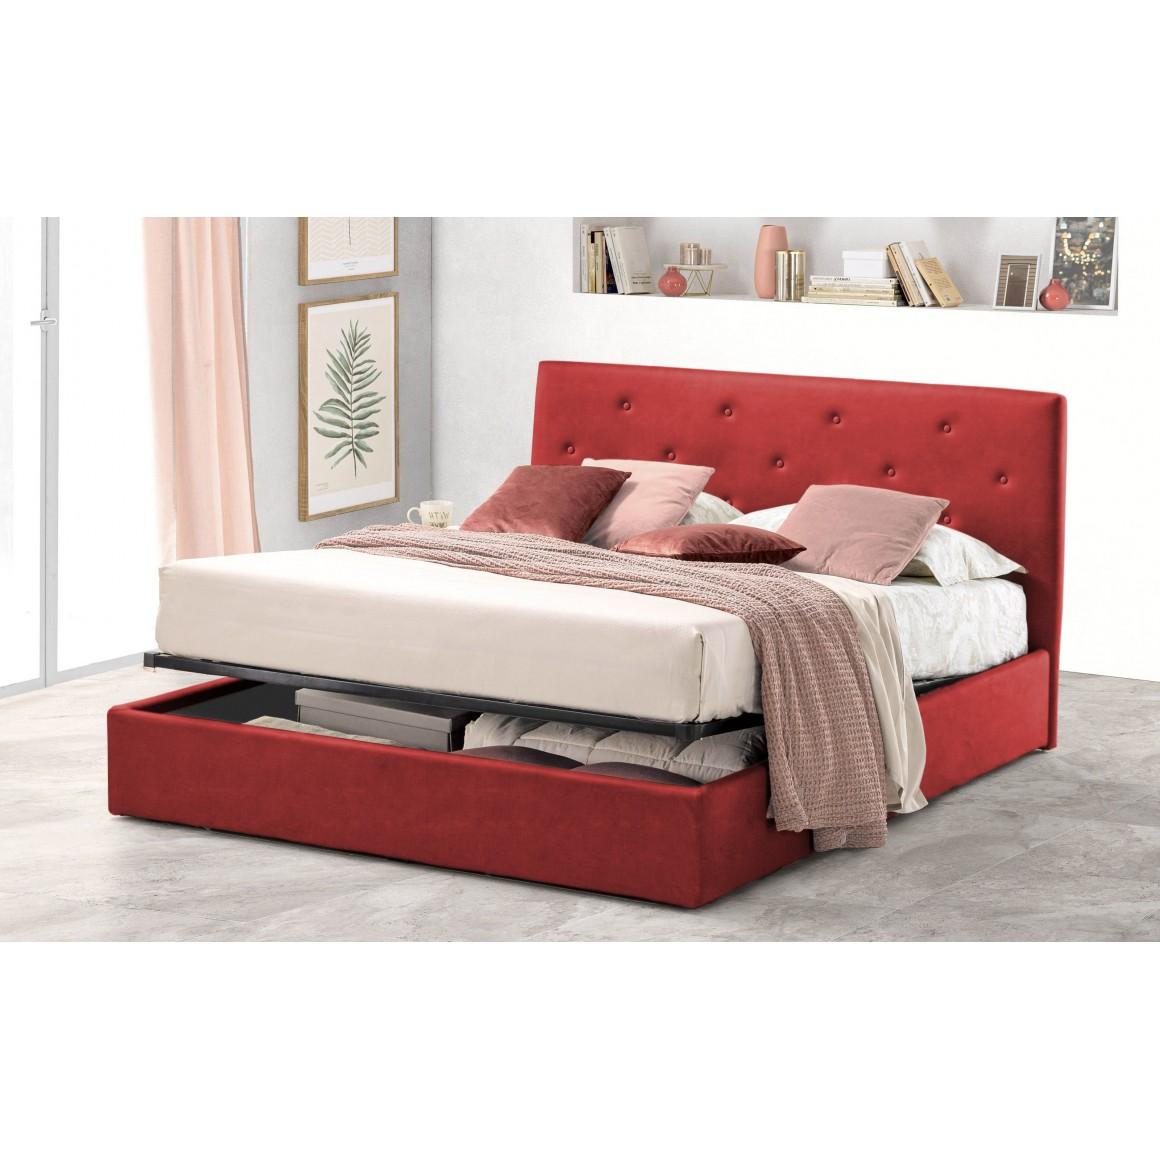 Pat Tapitat pentru Dormitor cu Lada, 180x200, Rombo Promo Dolce Dormire, Textil, Rosu